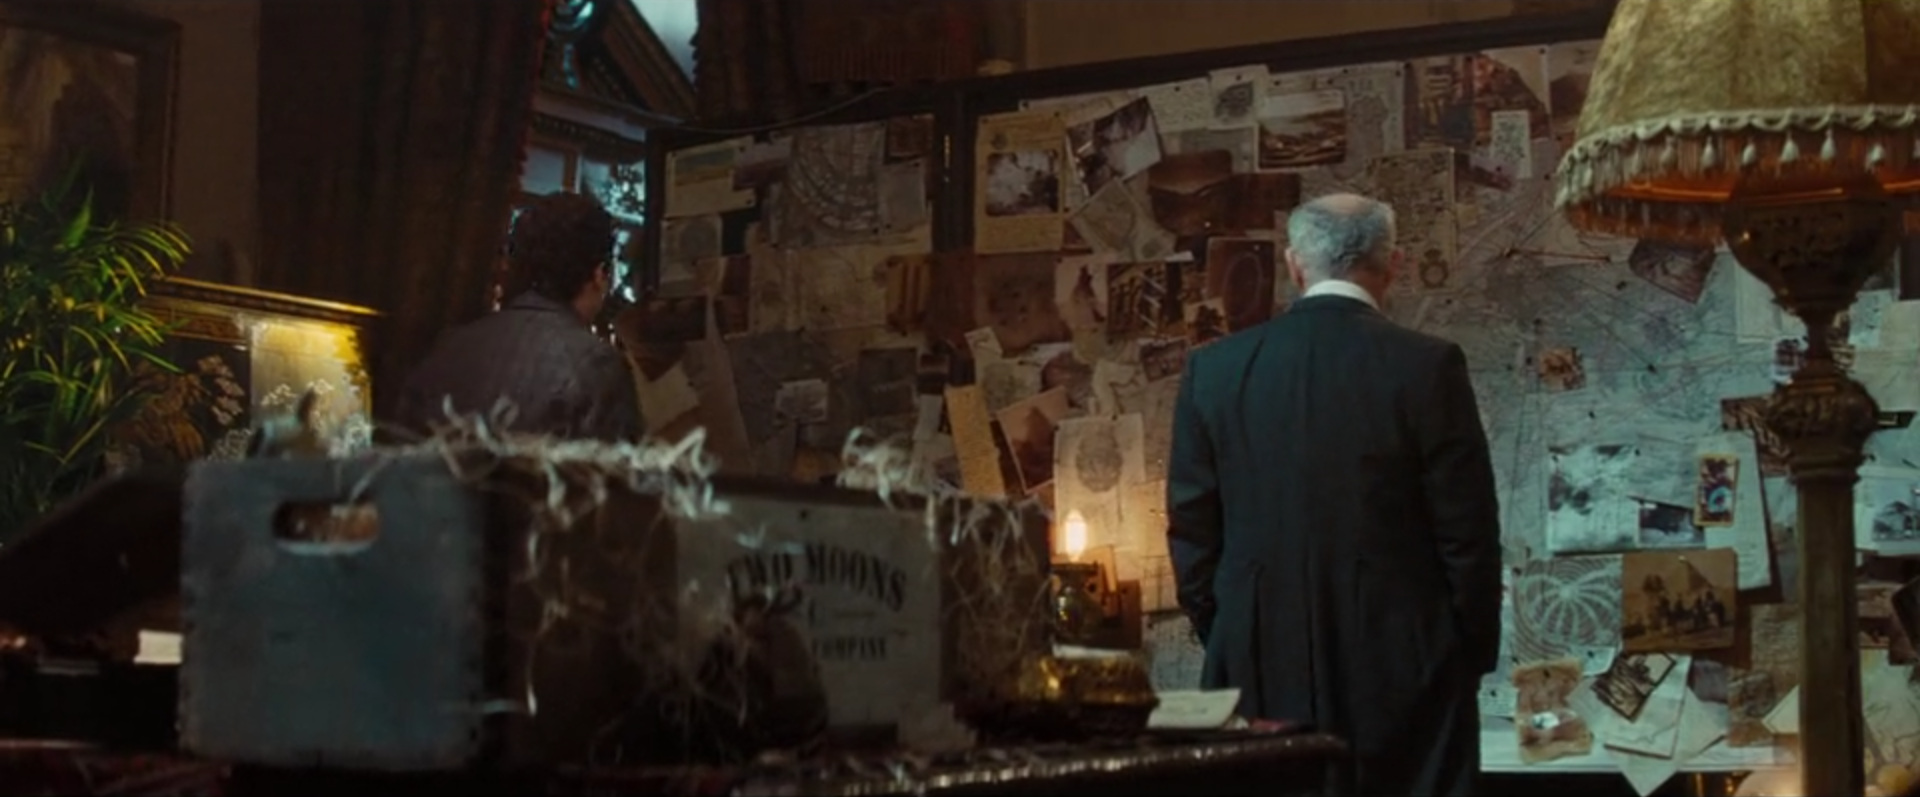 John Carter  (dir. Andrew Staunton, 2012)